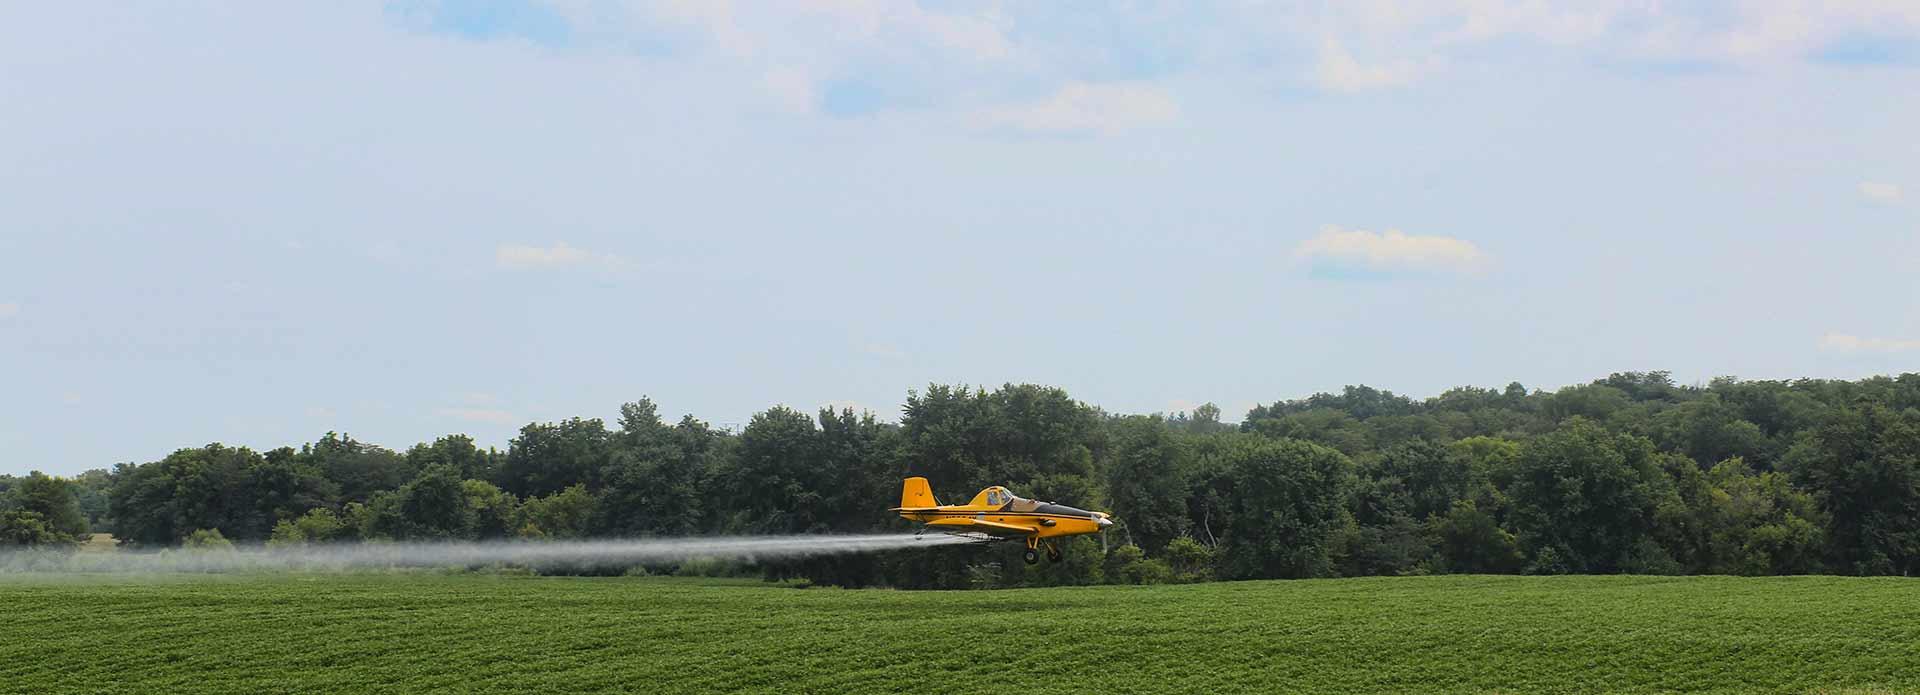 Eldon-C-Stutsman-Inc-Agronomy-Aerial-Application